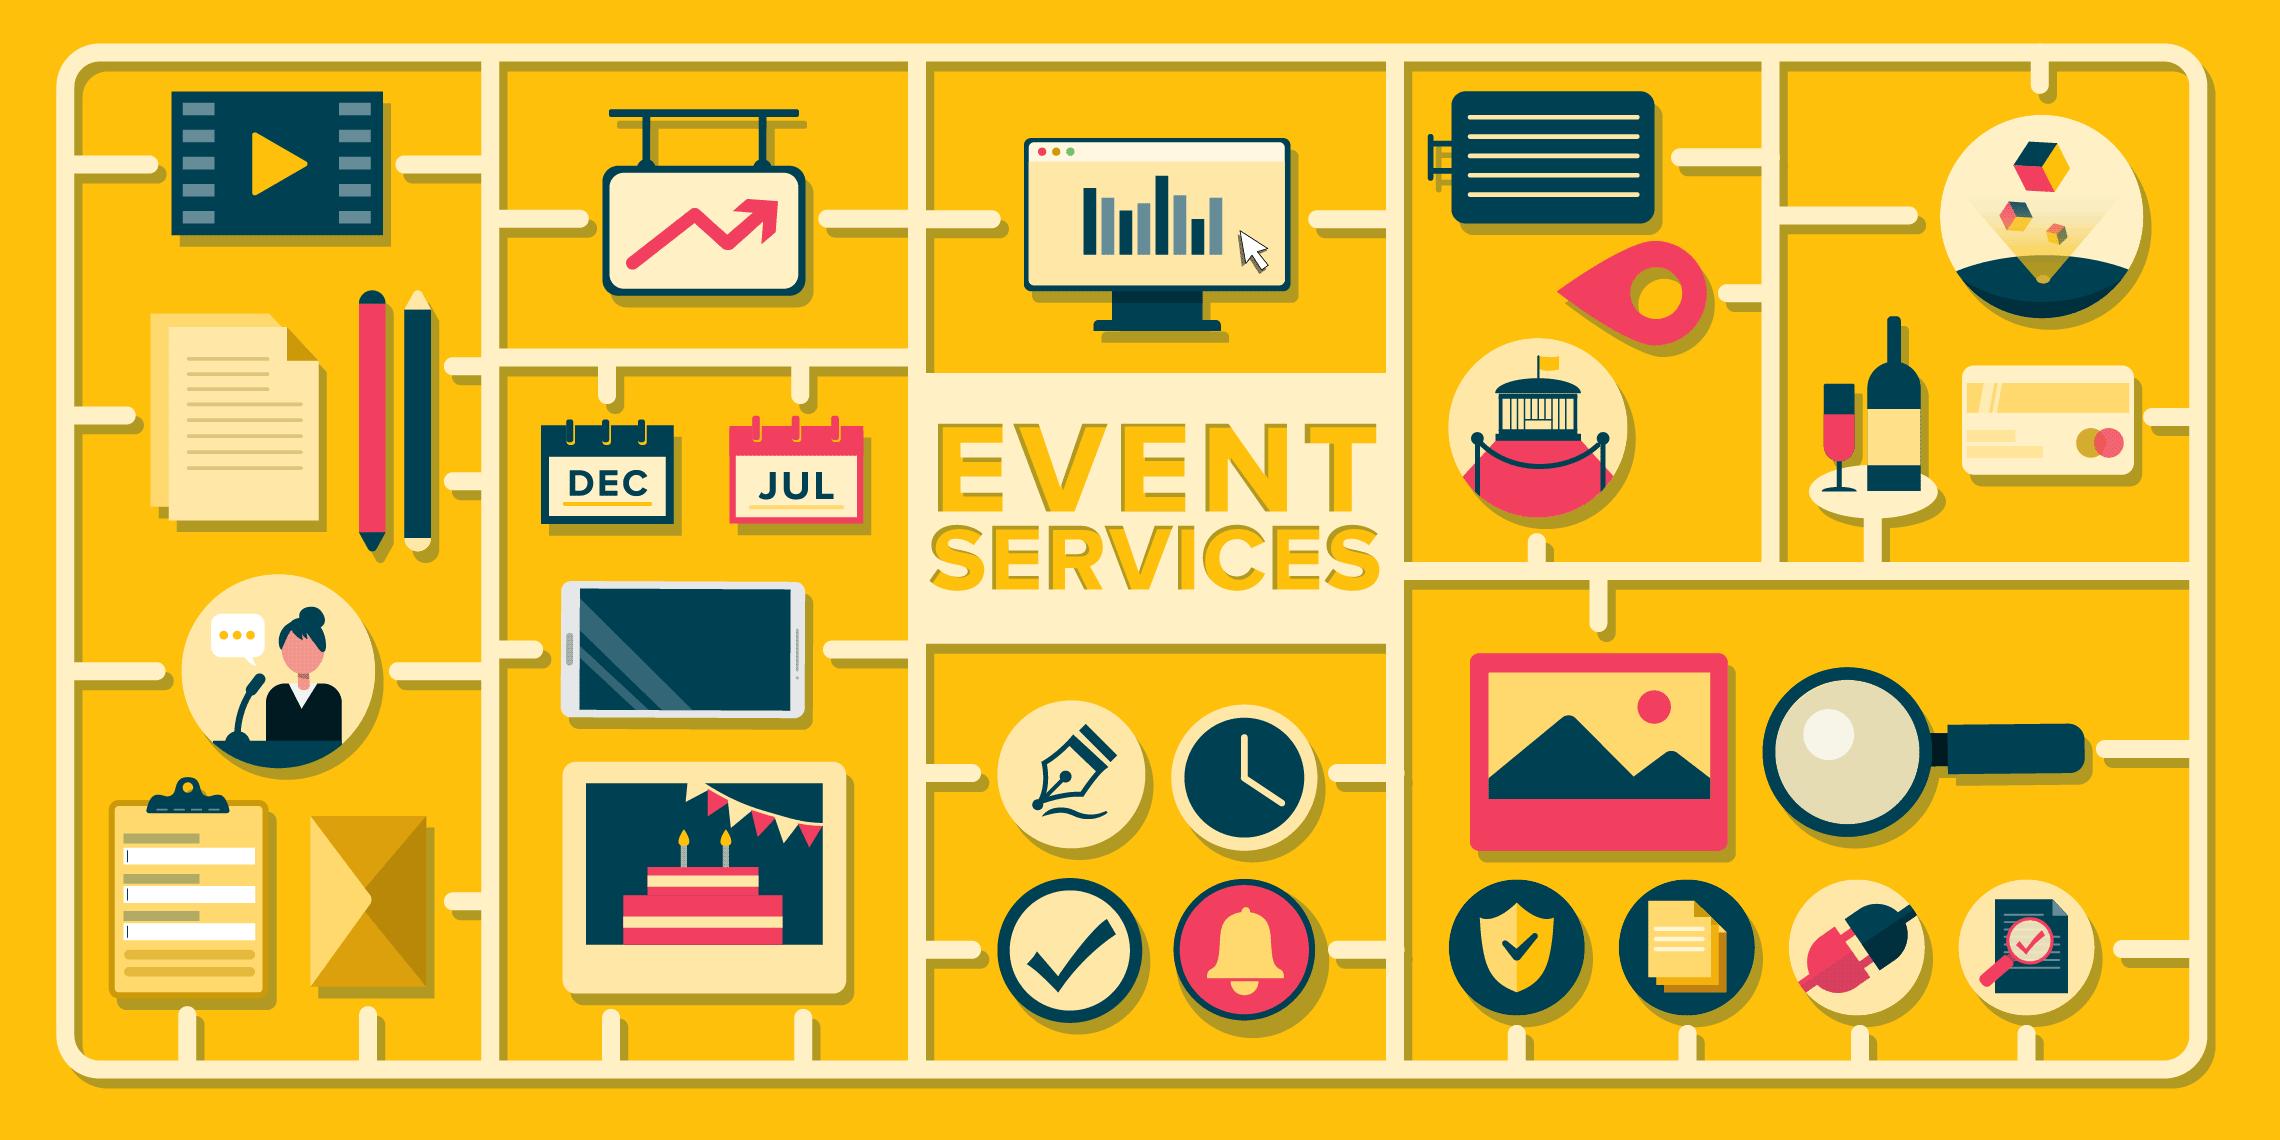 event services proposal ideas